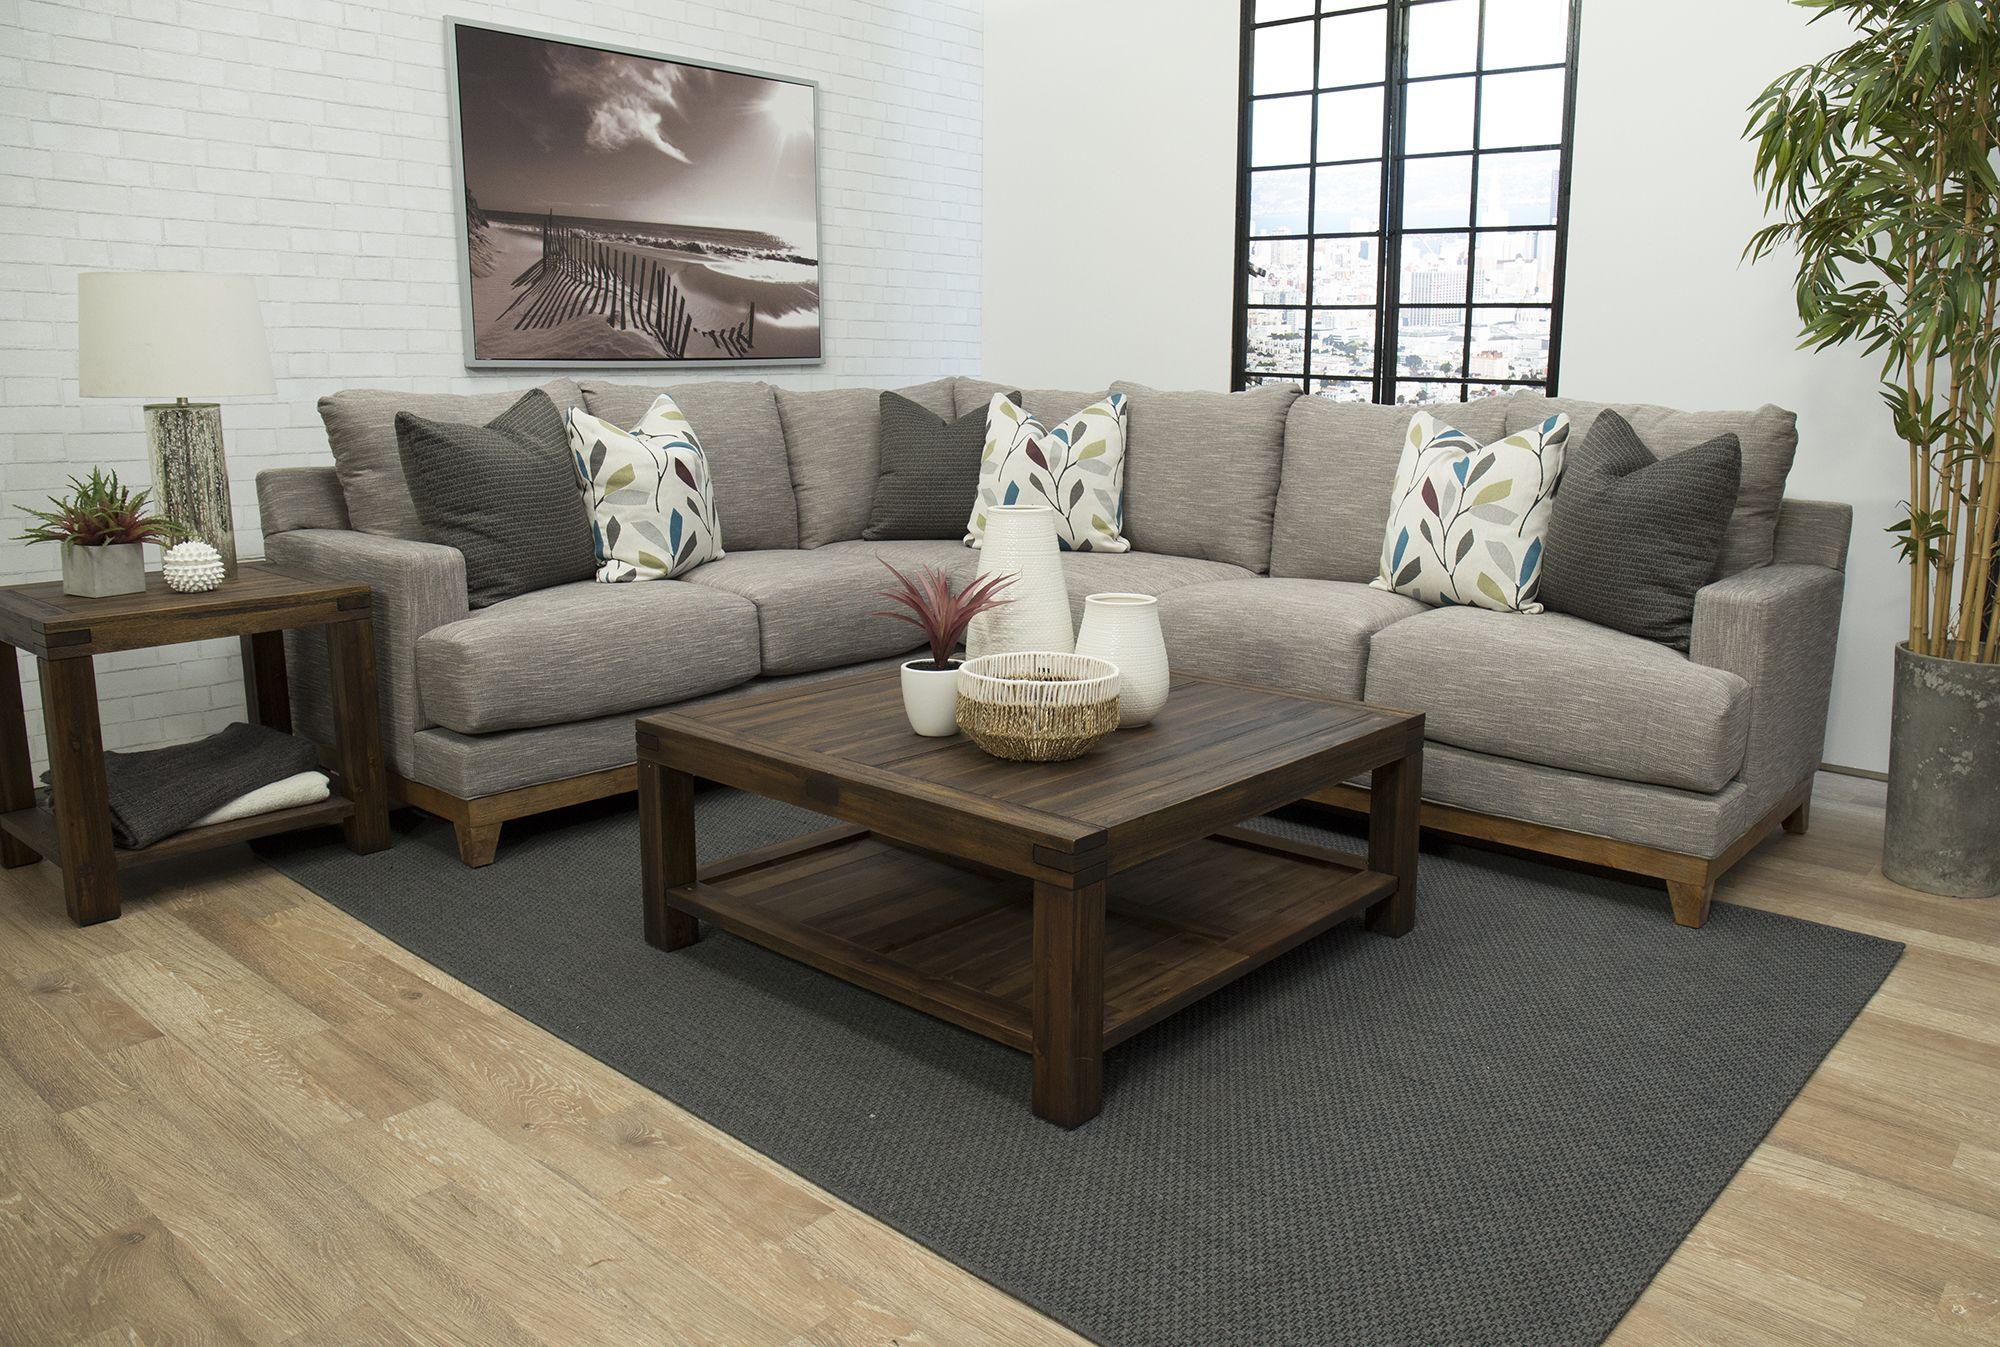 Gray Casual Contemporary 2 Piece Sectional Sofa Dayton Sectional Sofa 2 Piece Sectional Sofa Sectional